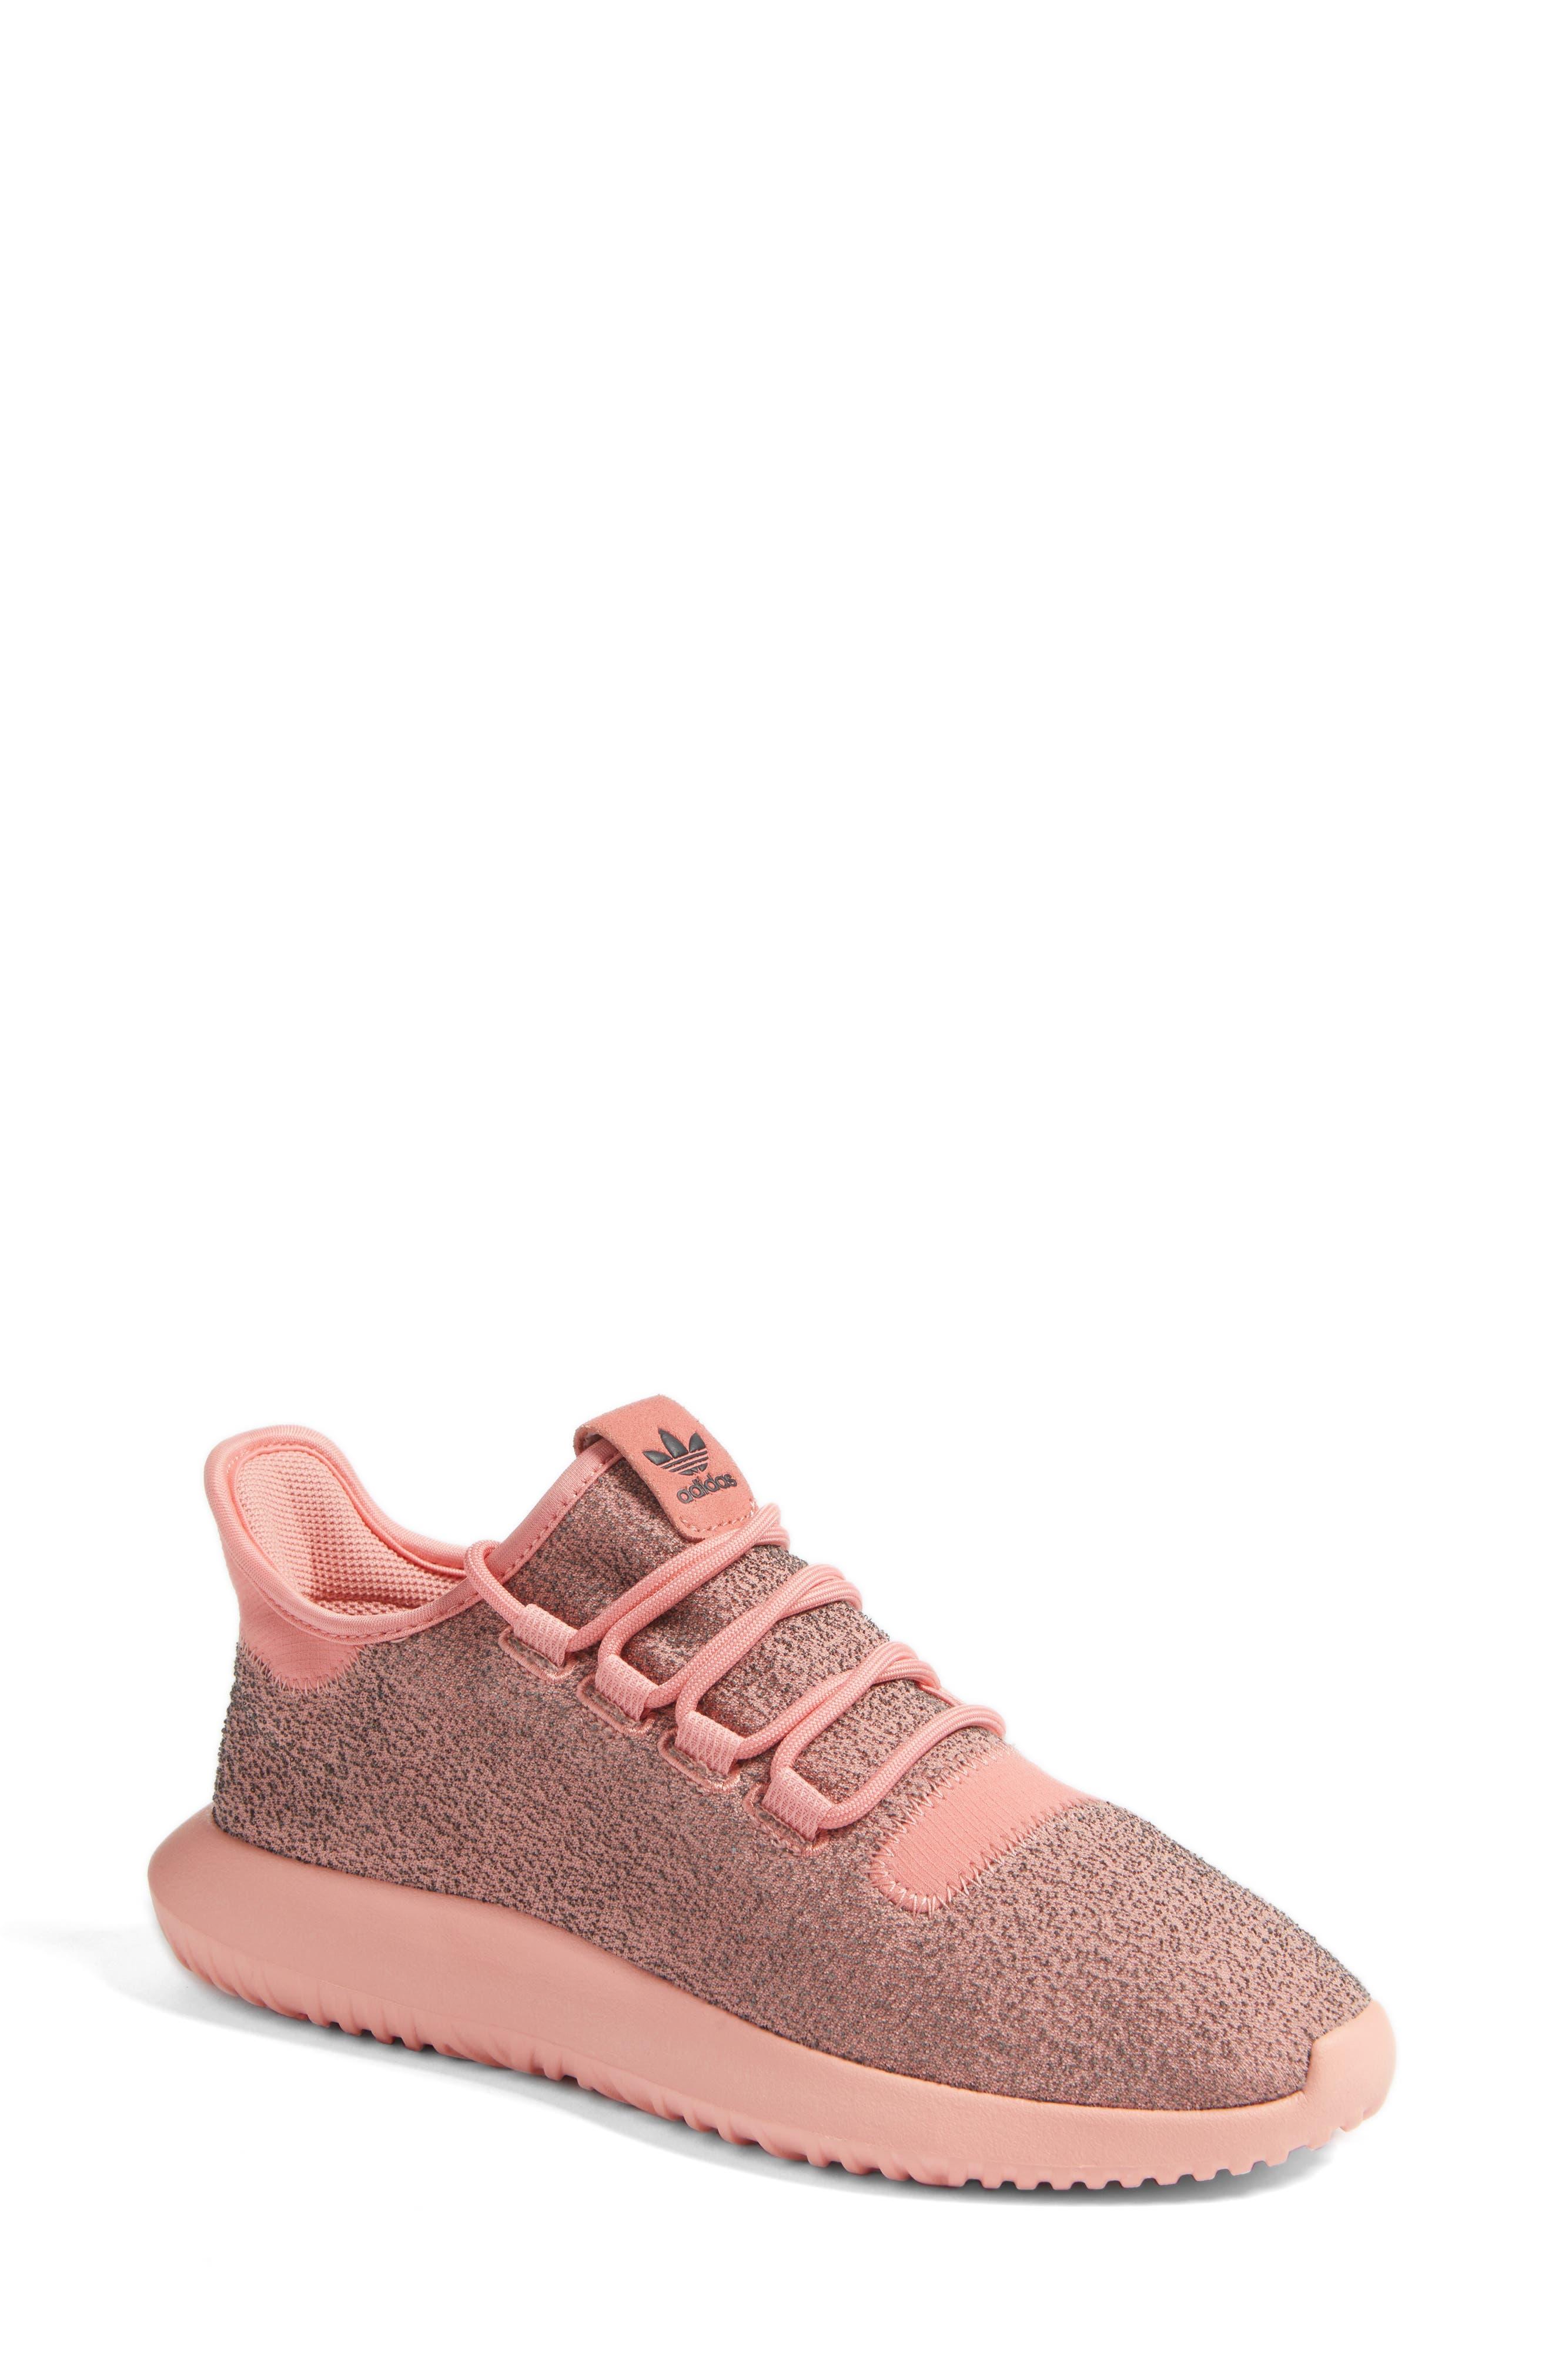 adidas Tubular Shadow Sneaker (Women)